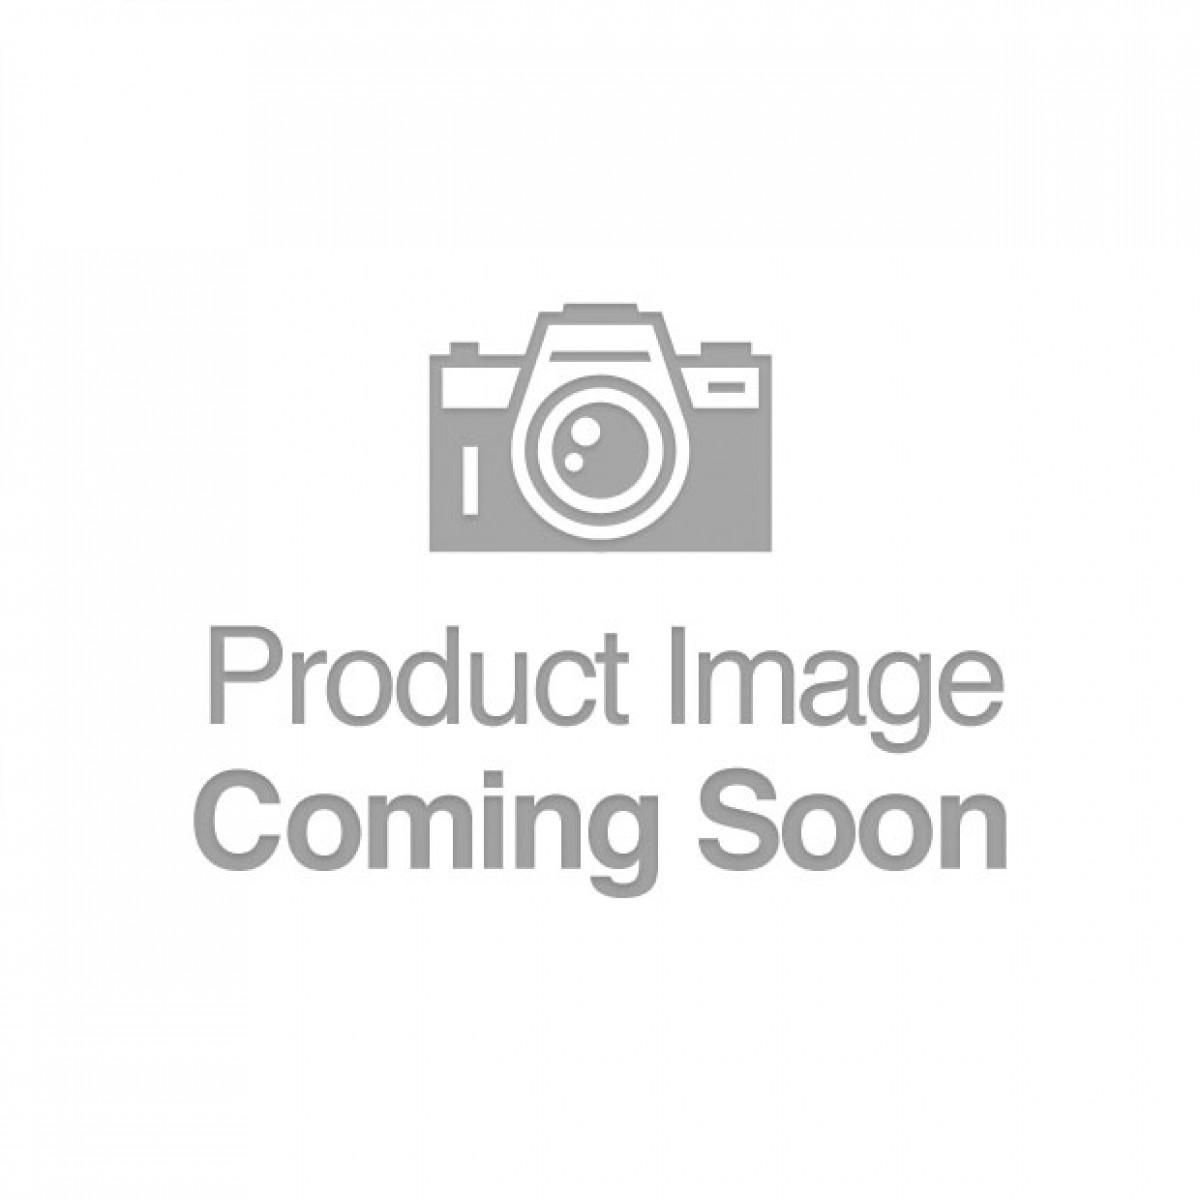 High Glide Erotic Lubricant - 2.3 oz Bottle